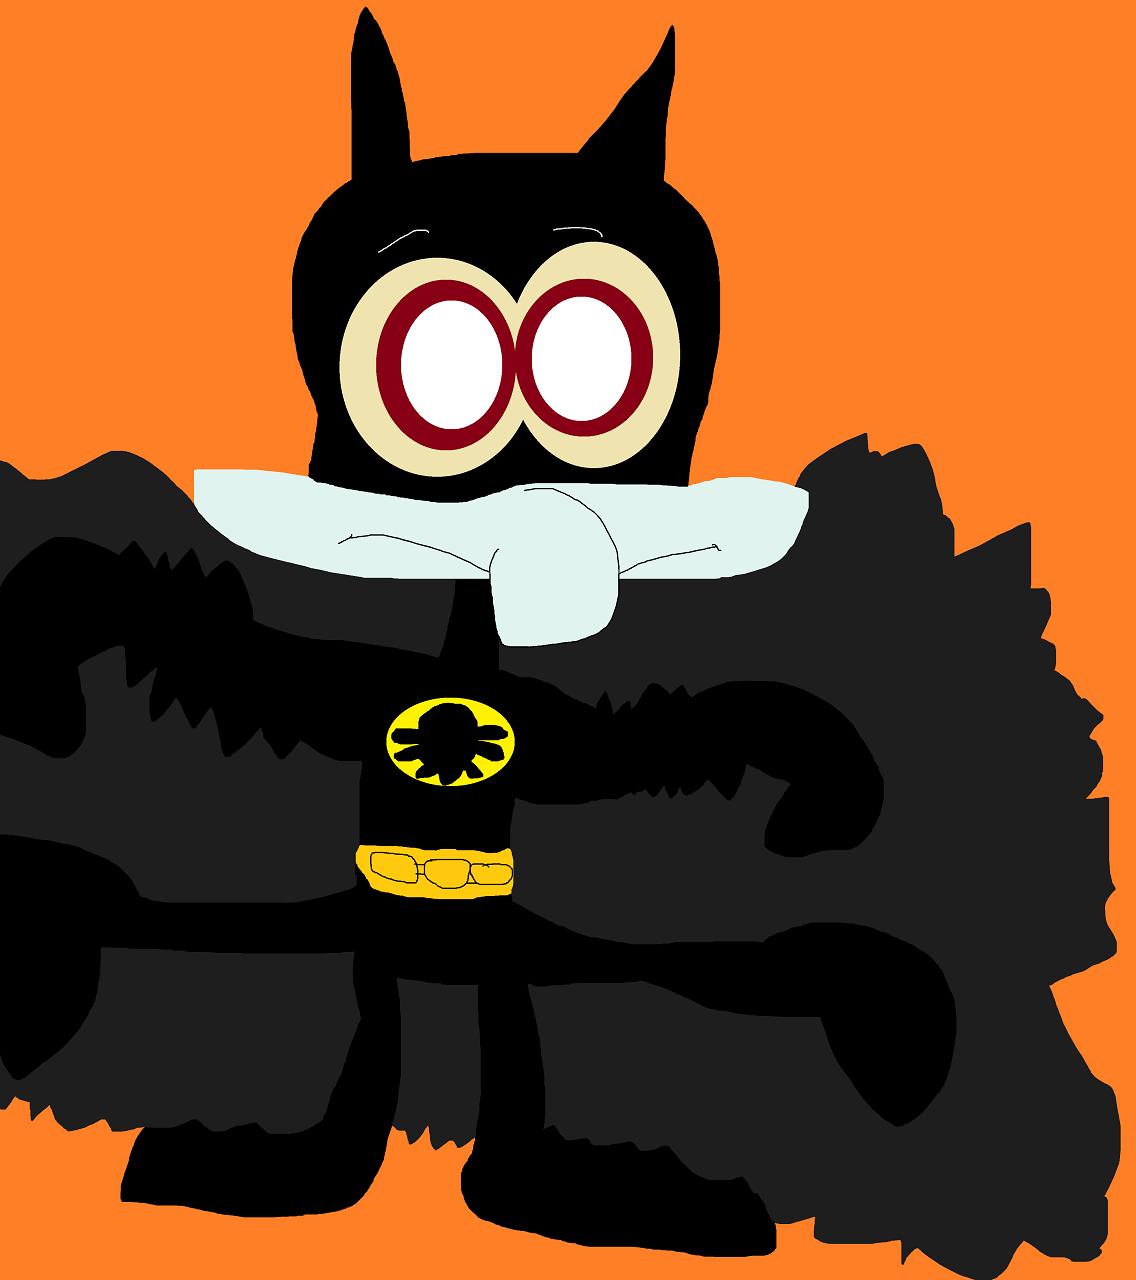 Random OctoBat by Falconlobo